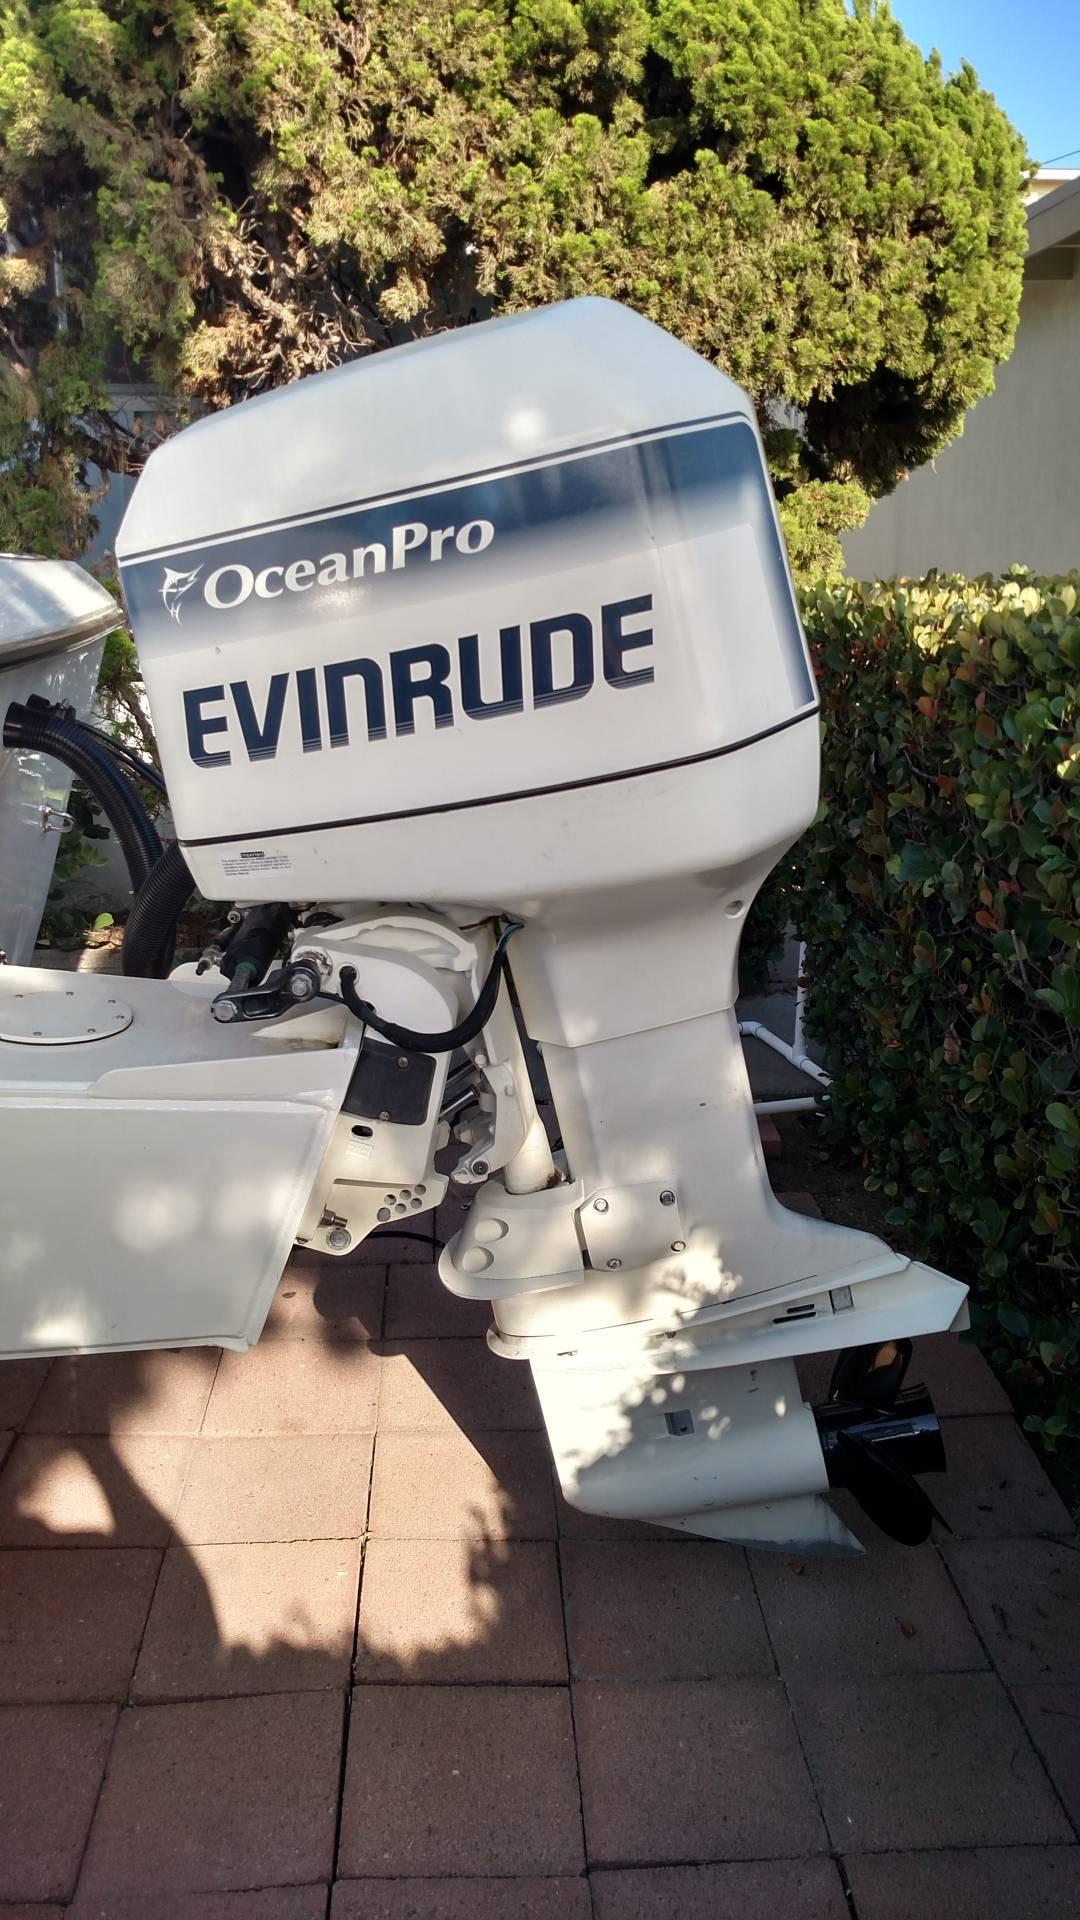 Evinrude Ocean Pro 200 036.jpg